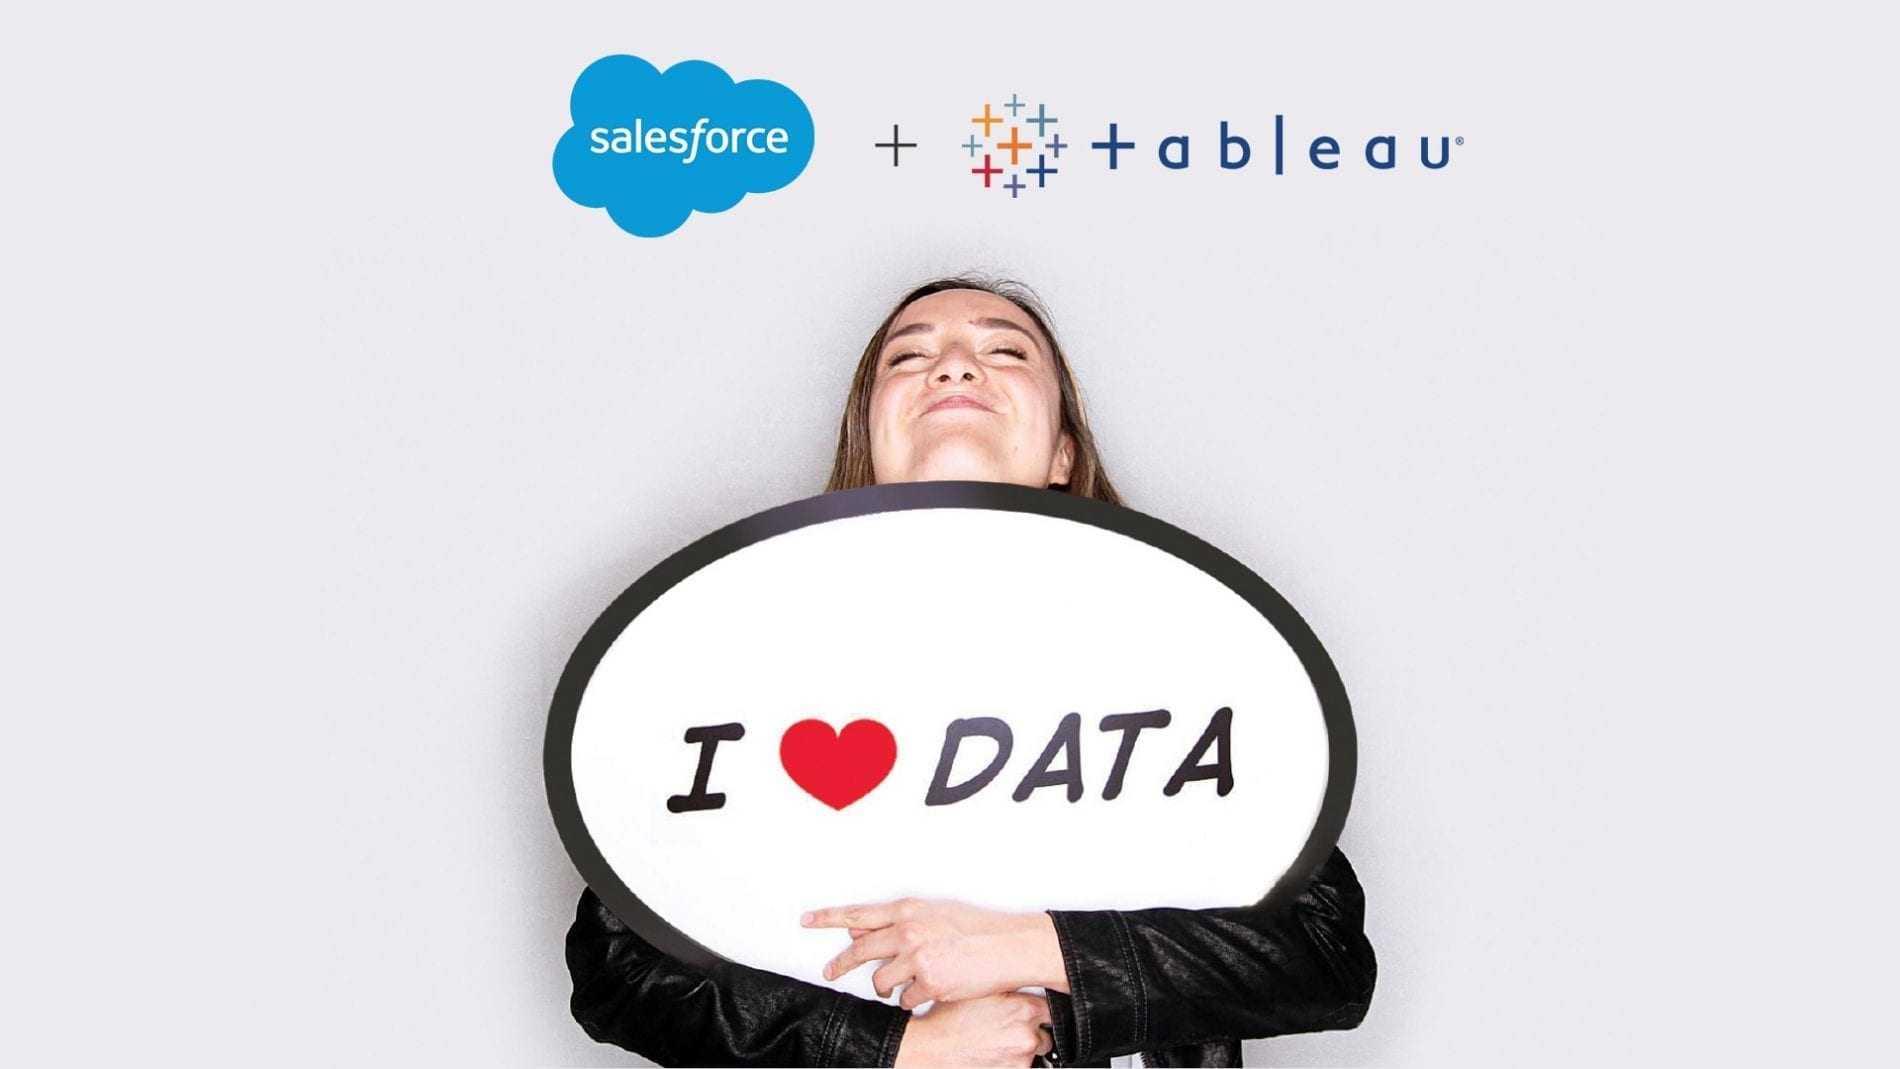 I_love_data